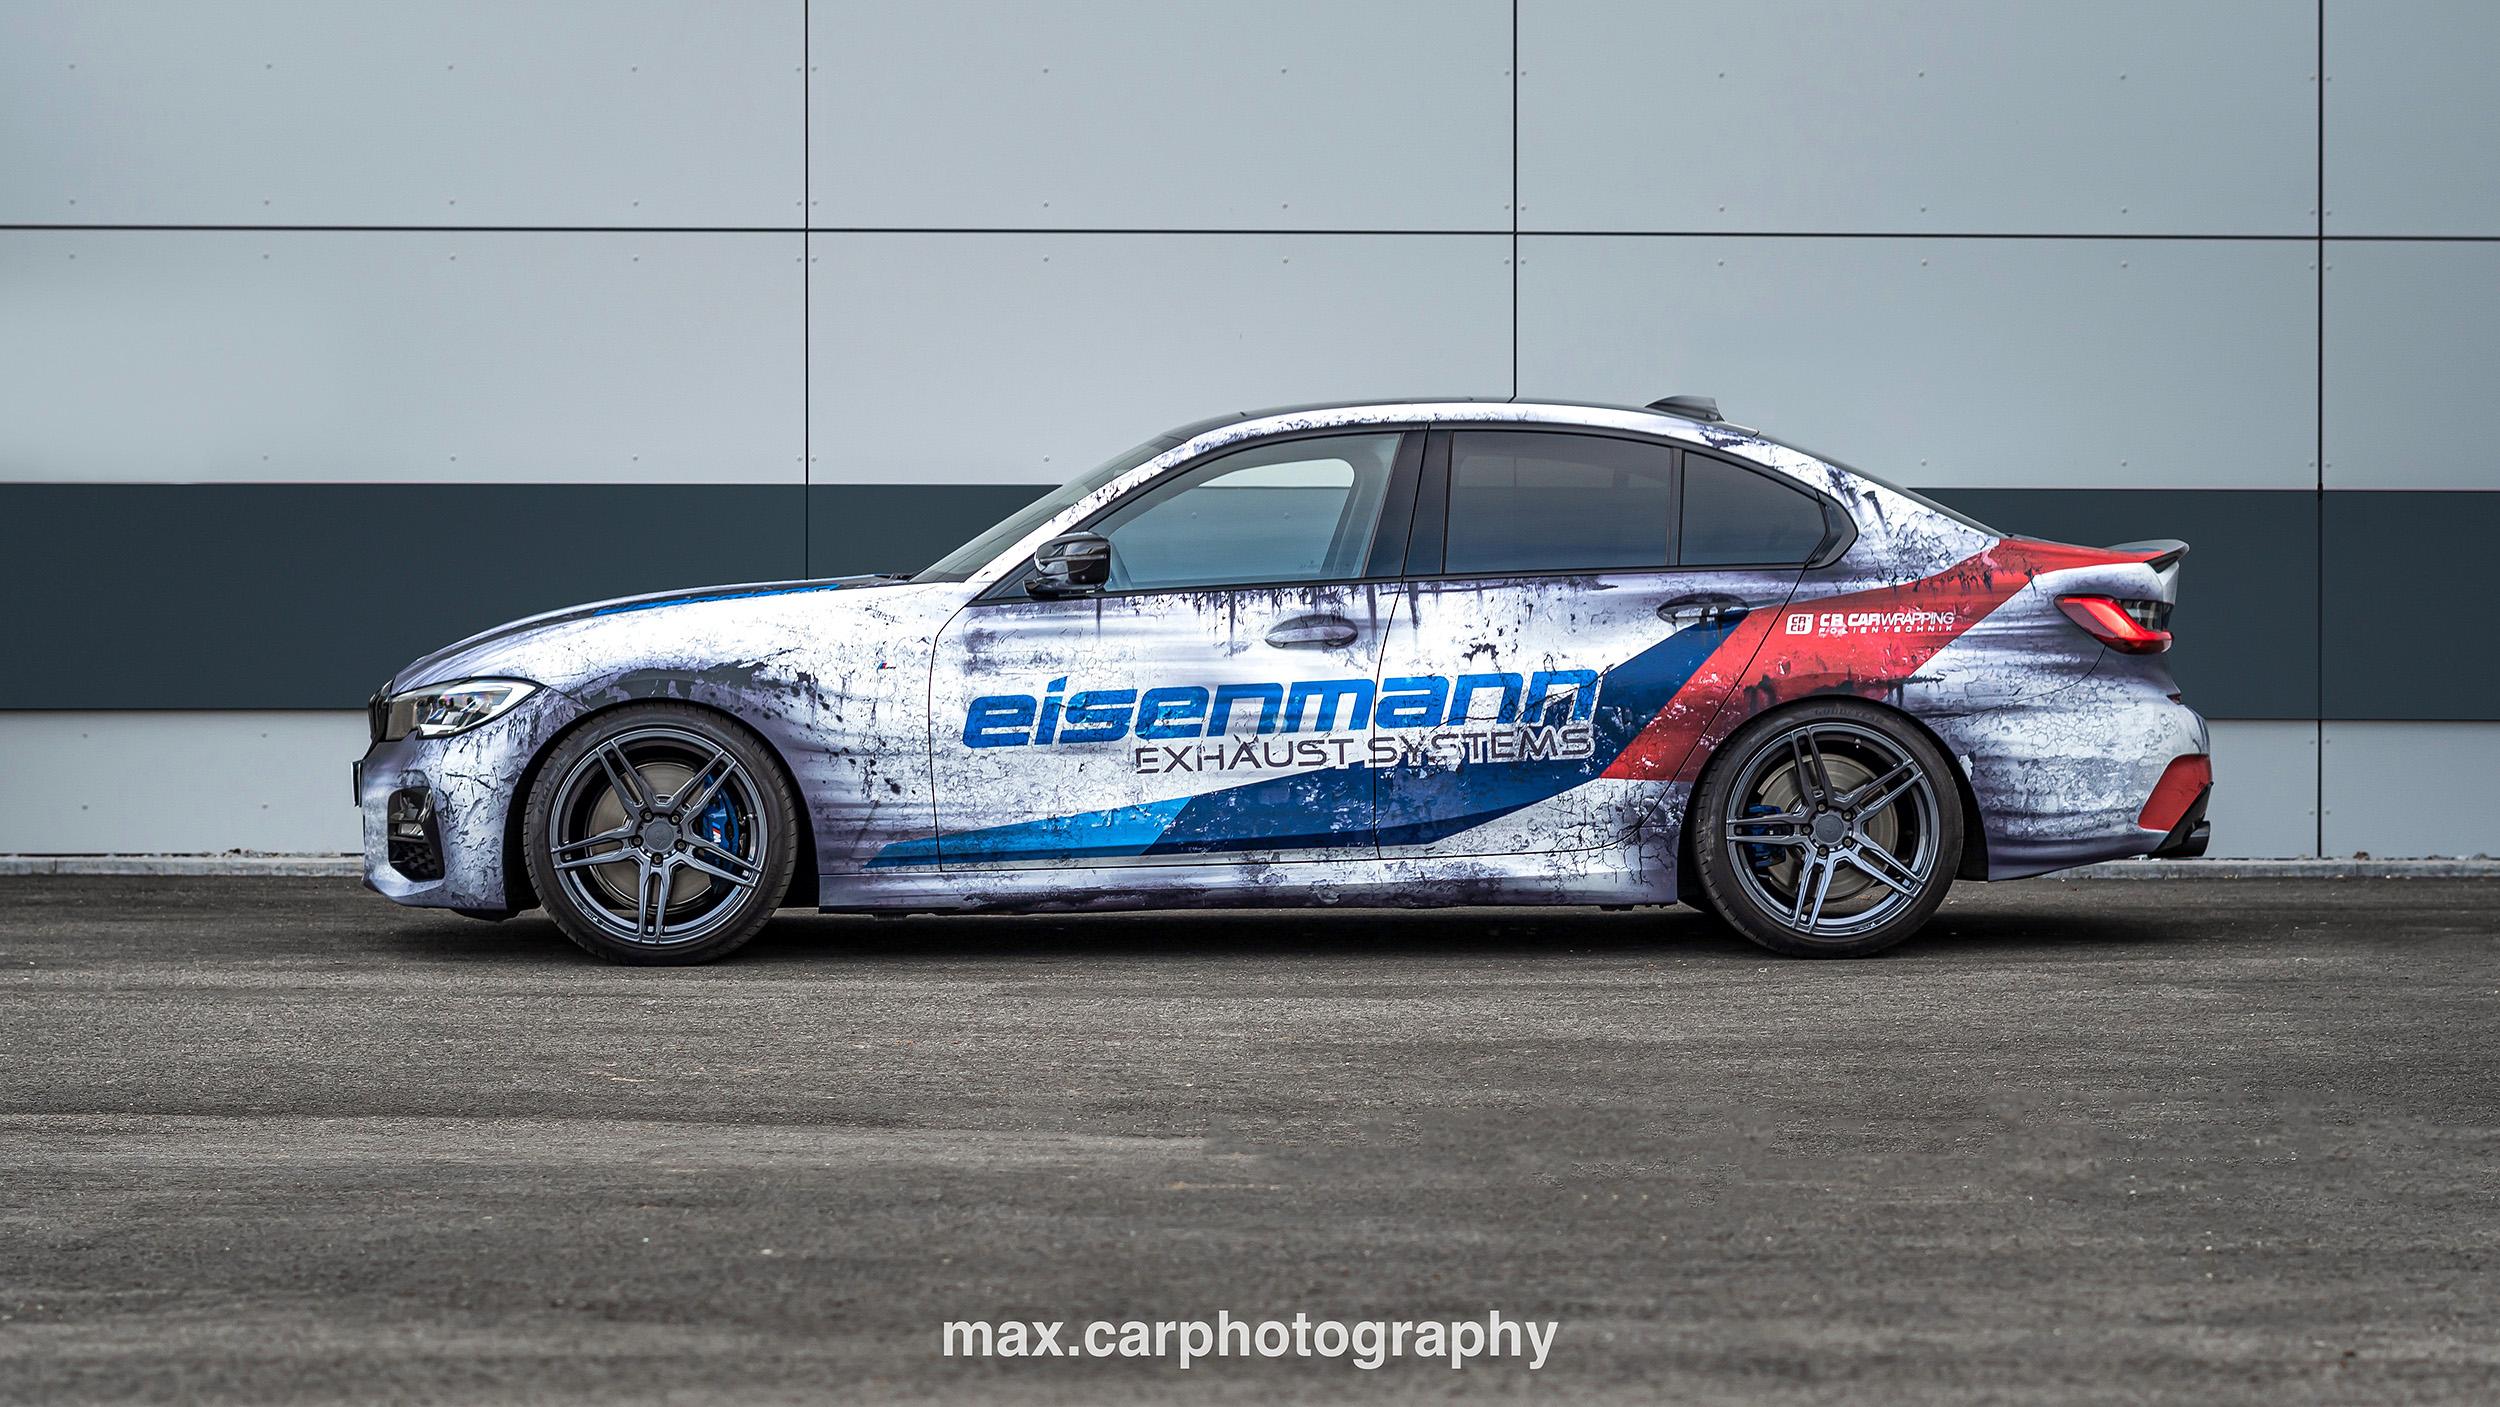 💥 Eisenmann Exhaust Systems BMW 💥